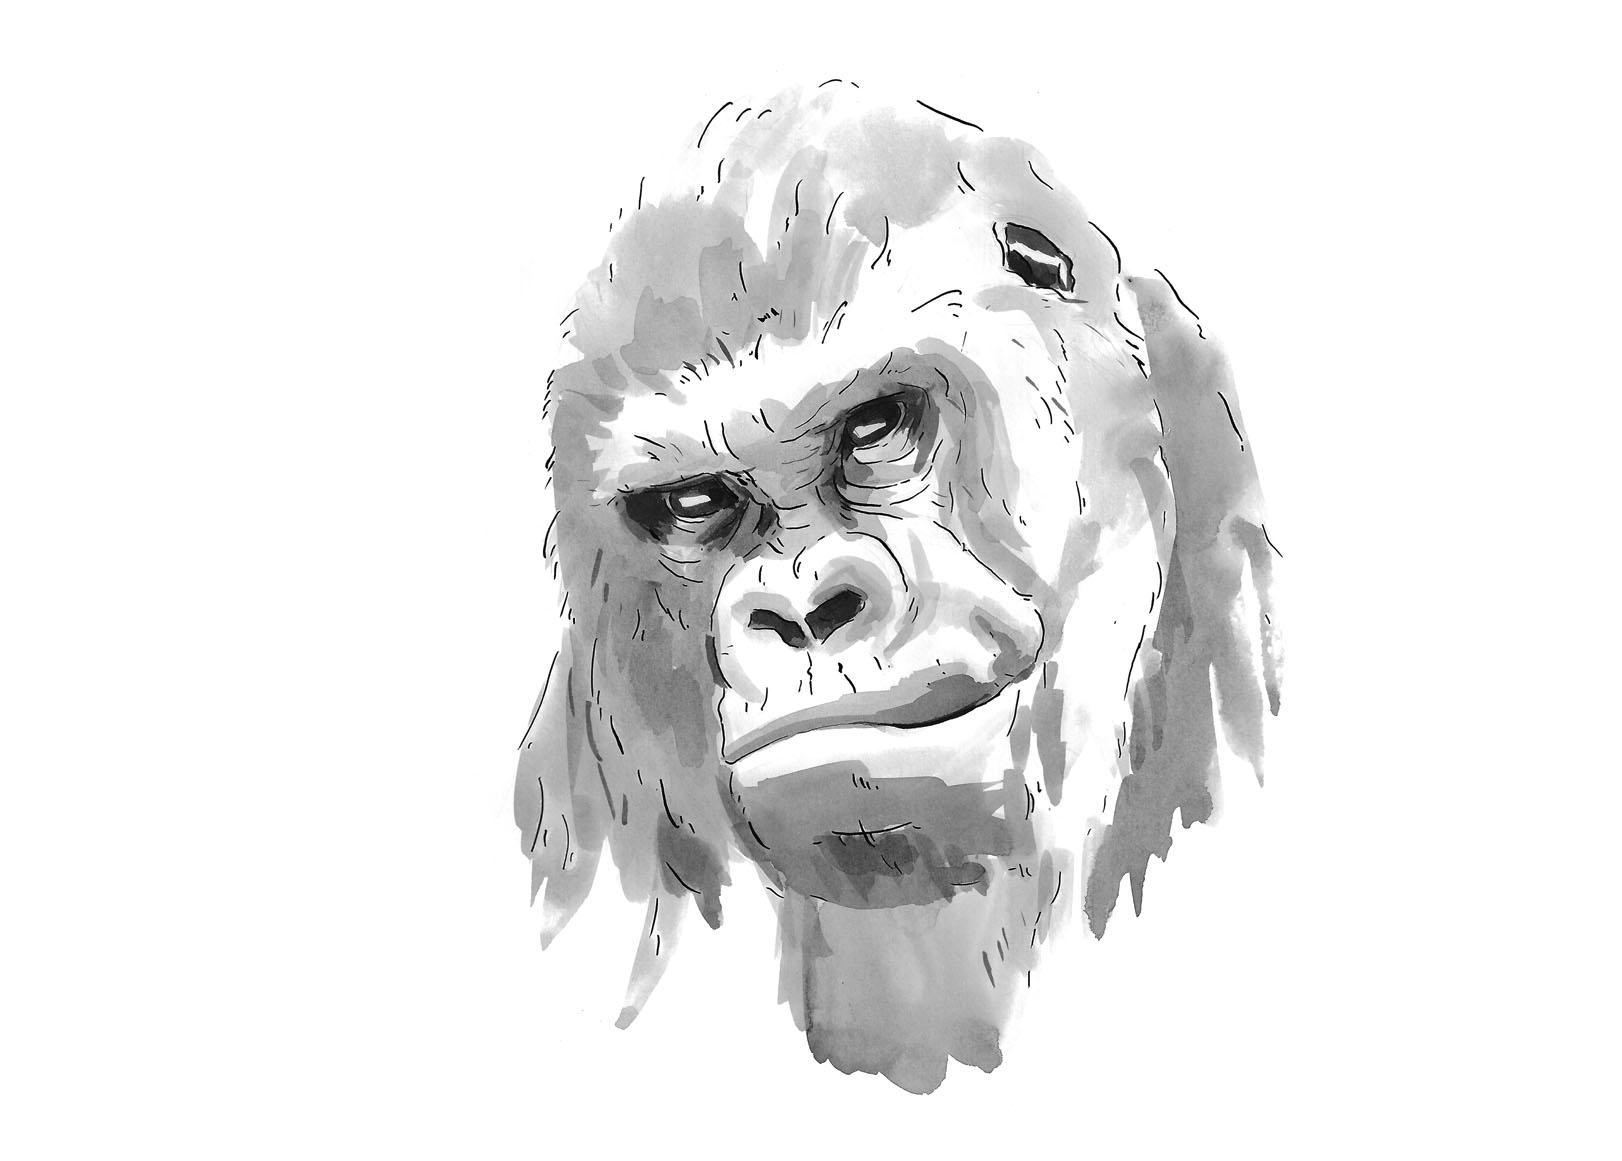 project_gorilla_october_72_no_resample.jpg